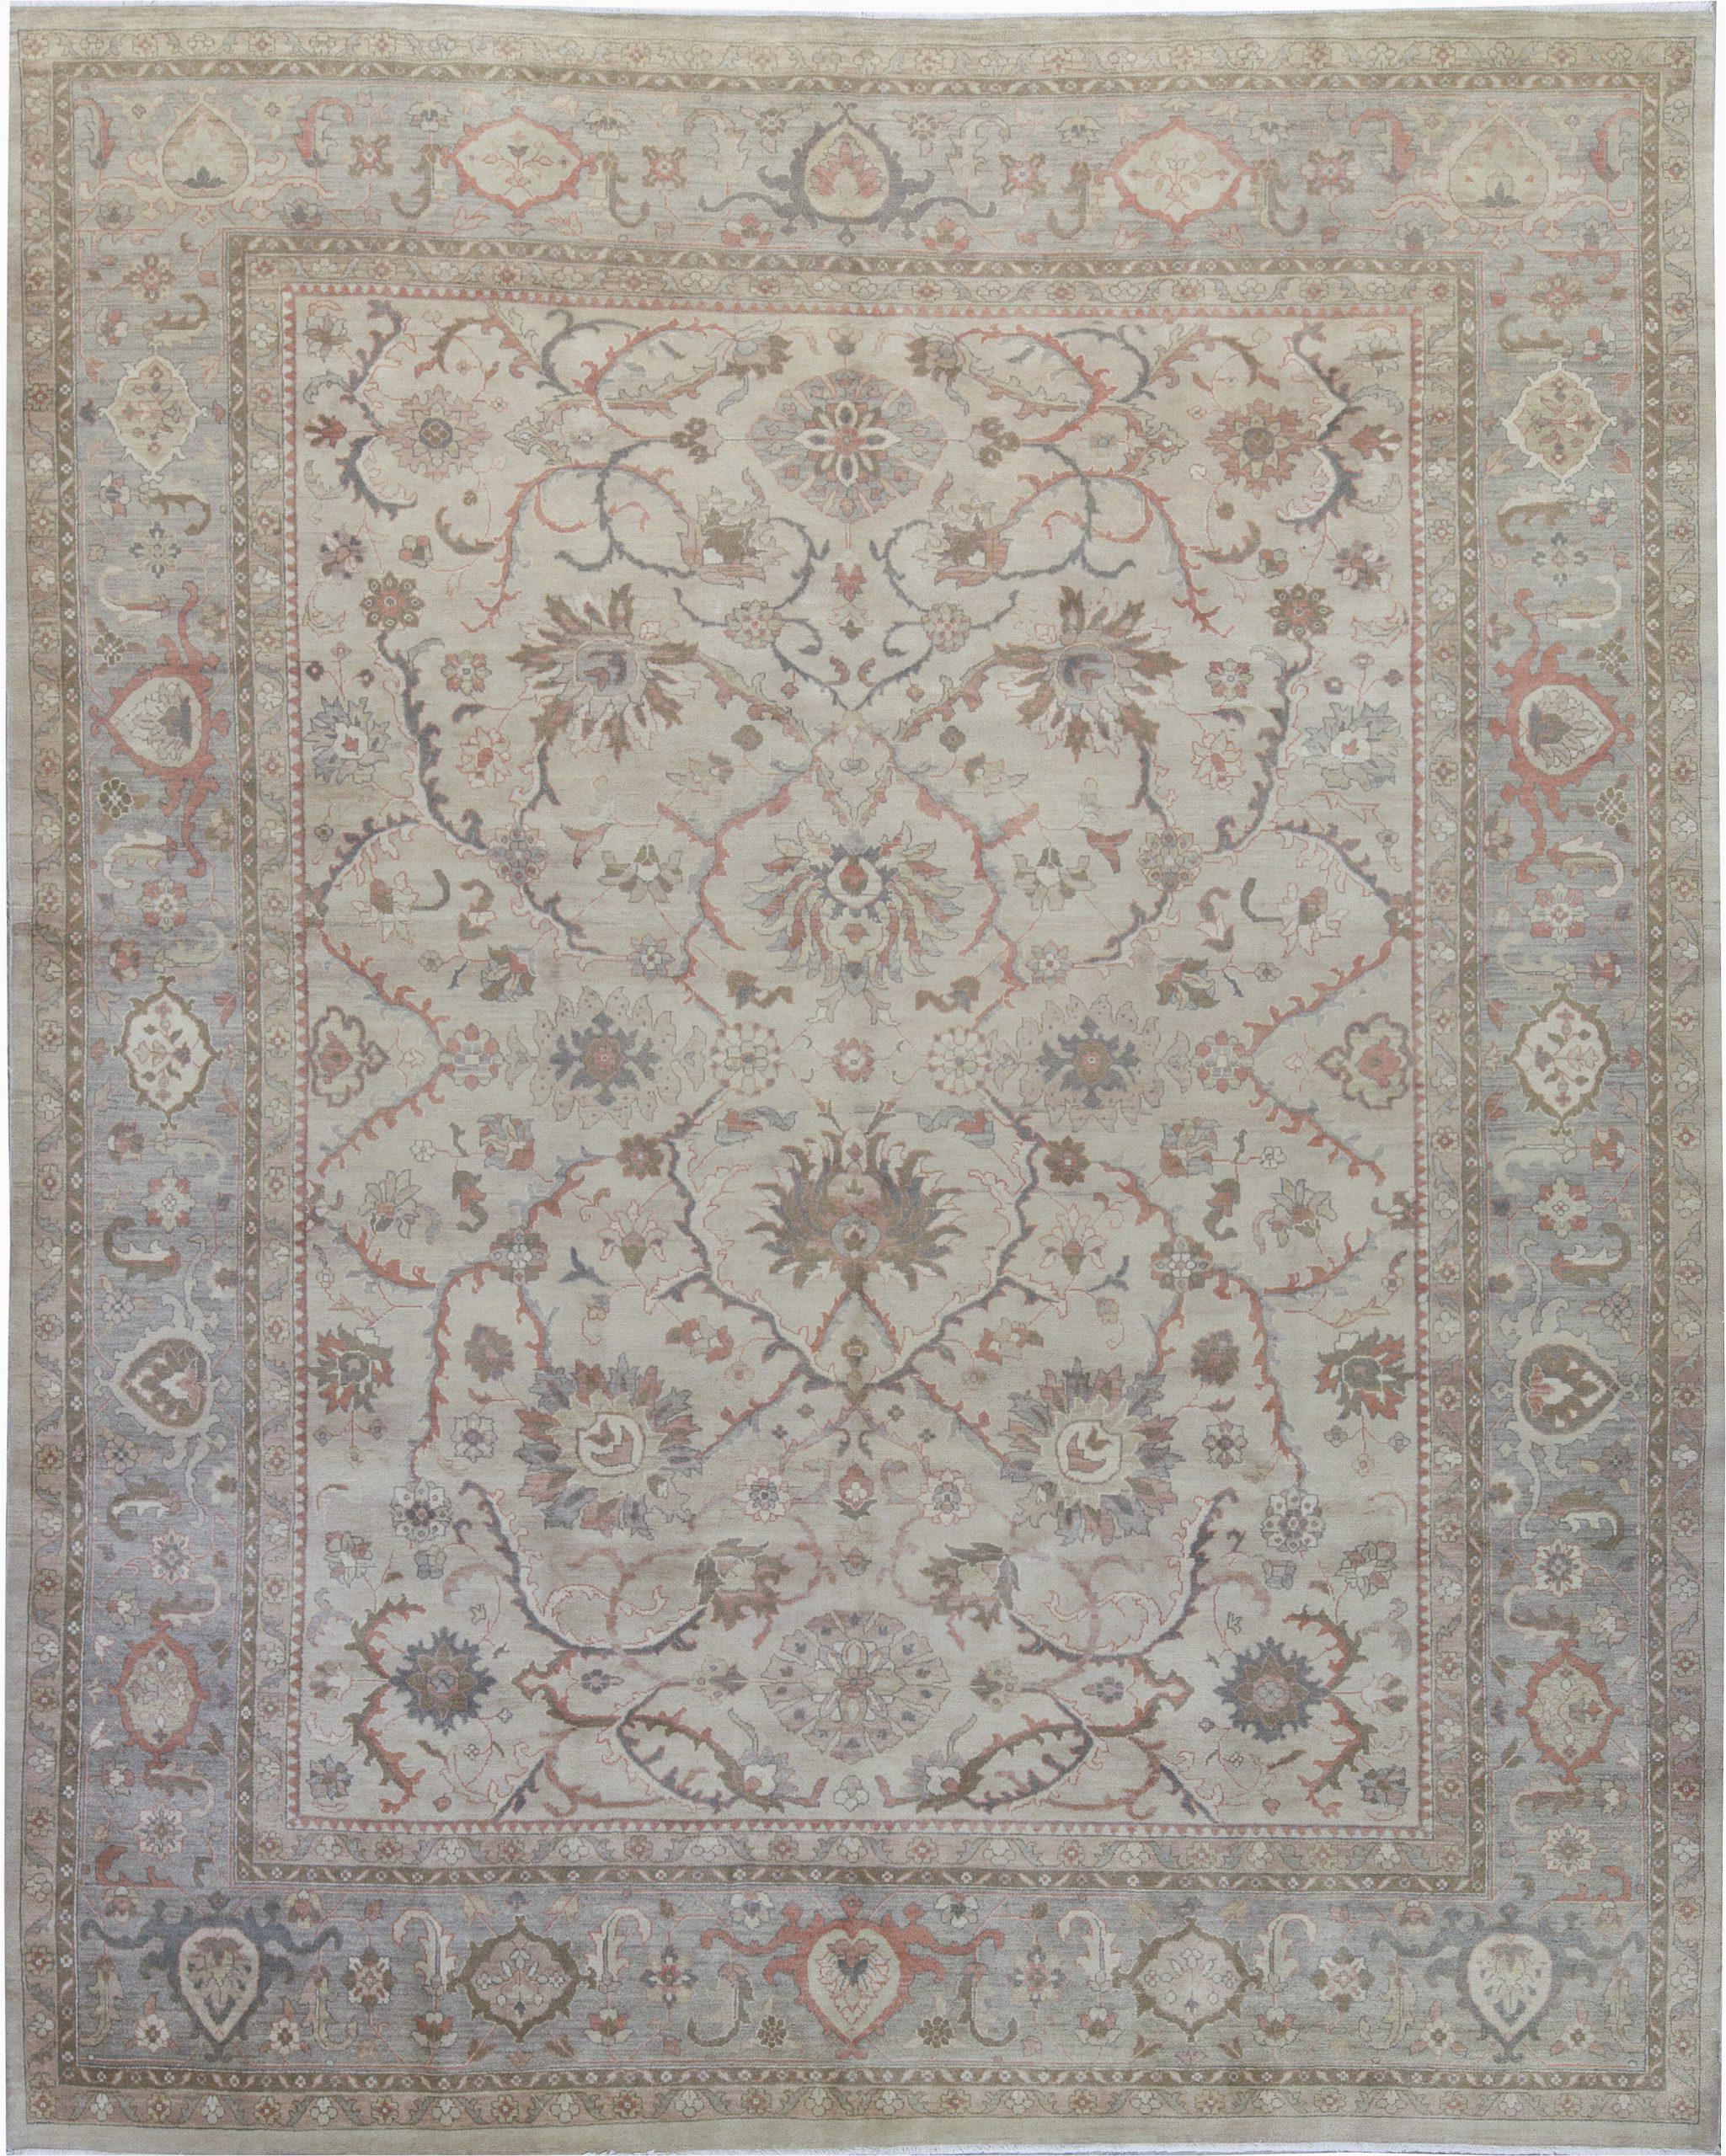 bokara rug co inc one of a kind hand knotted beige 118 x 142 area rug abhd6543